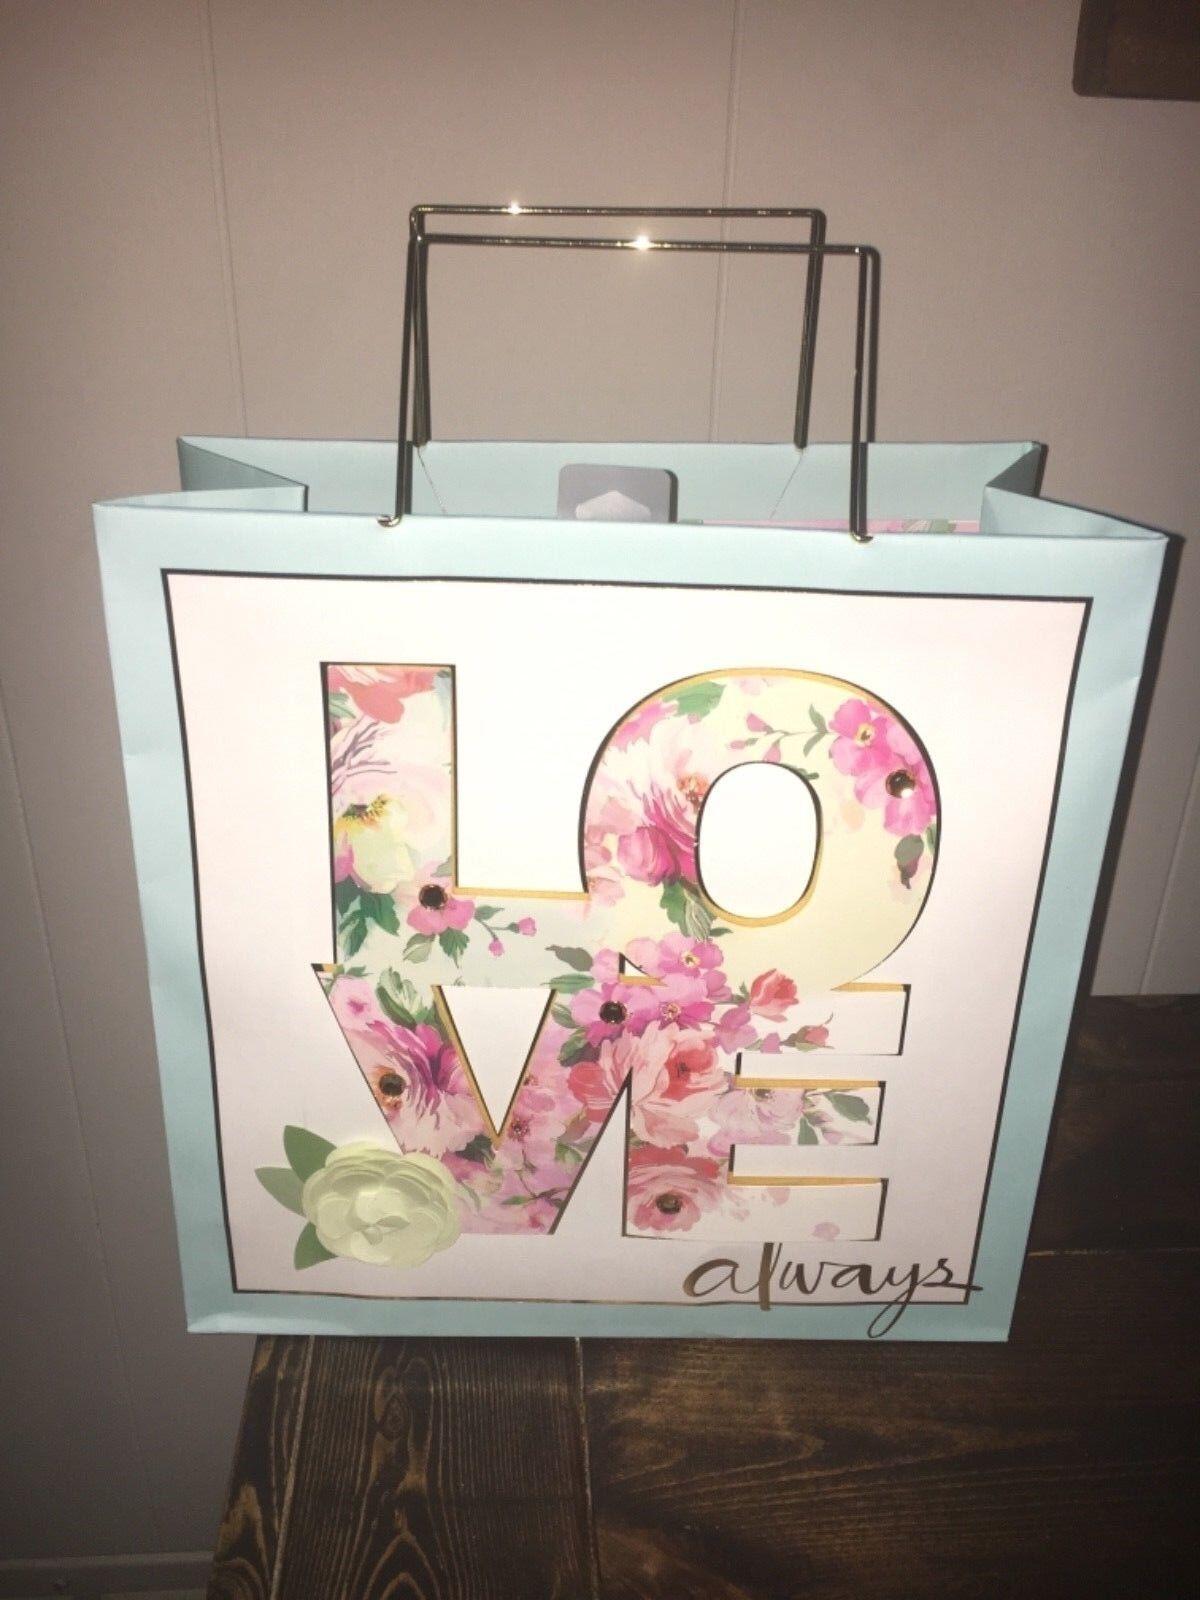 Hallmark Signature Flower Gift Bag For Birthday, Wedding, Br